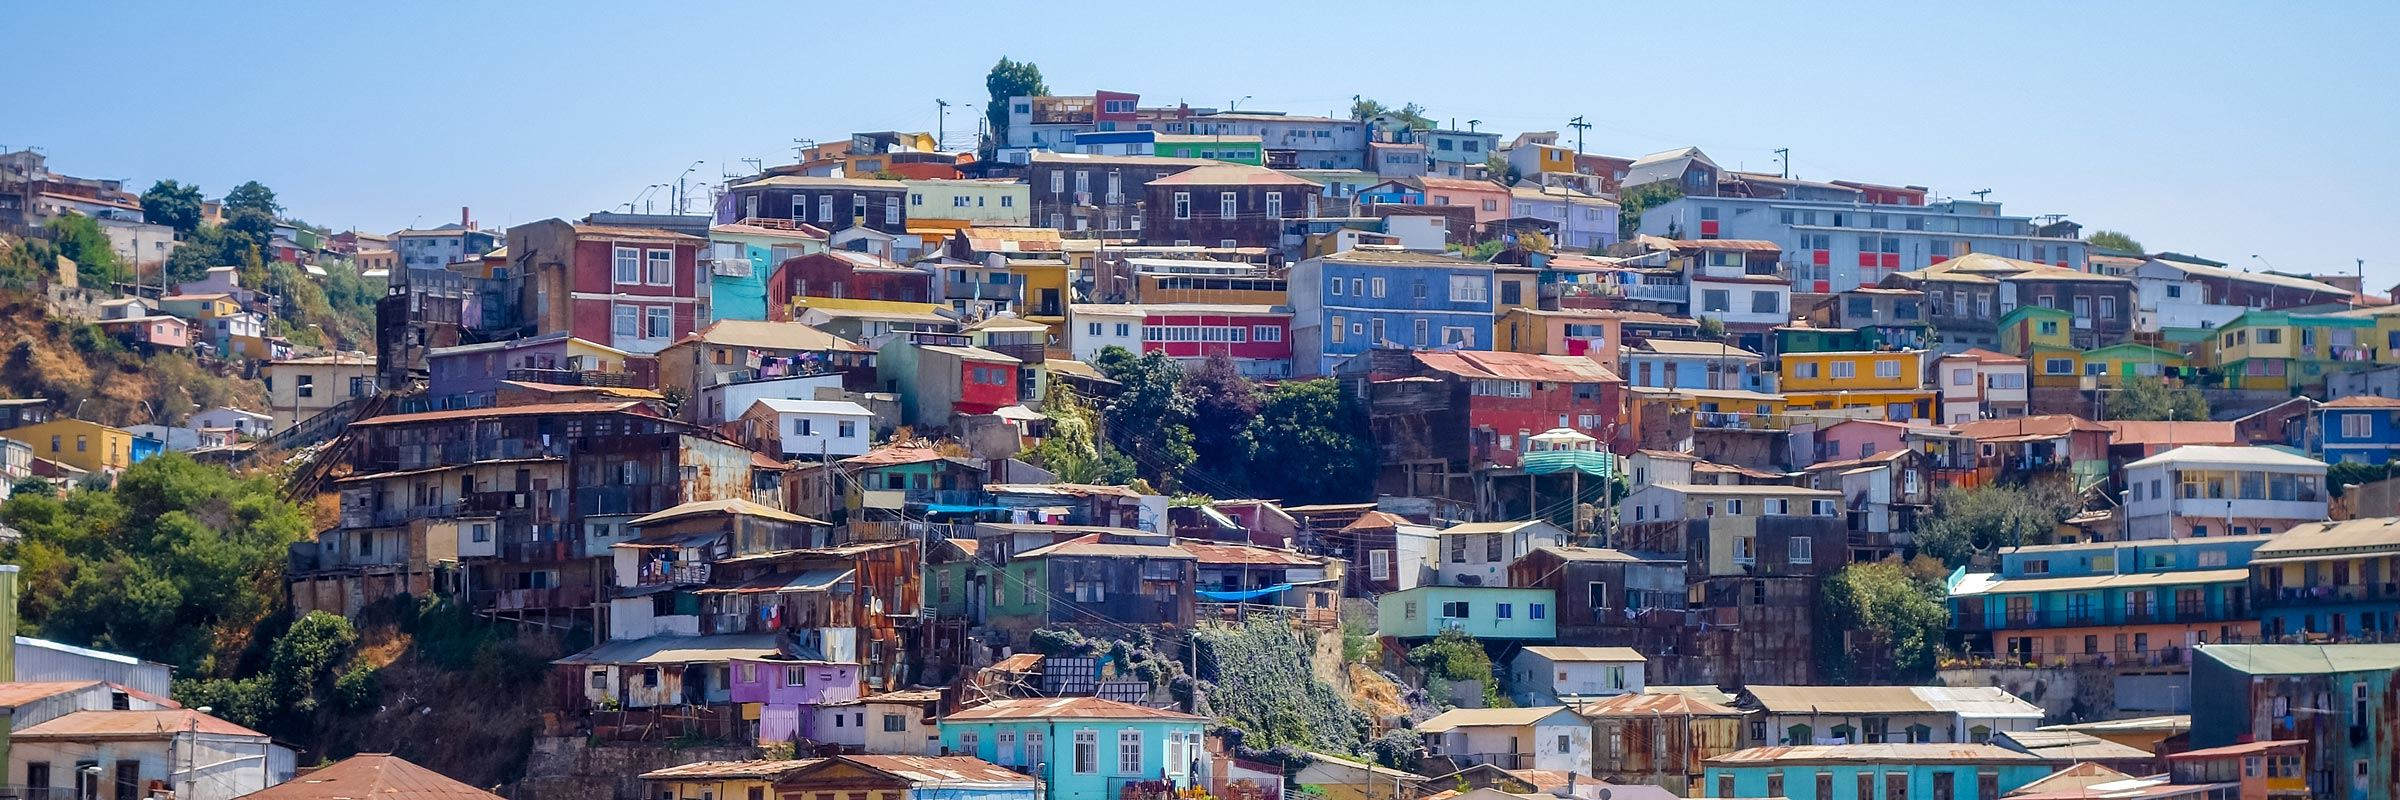 So Much to Do in Valparaiso